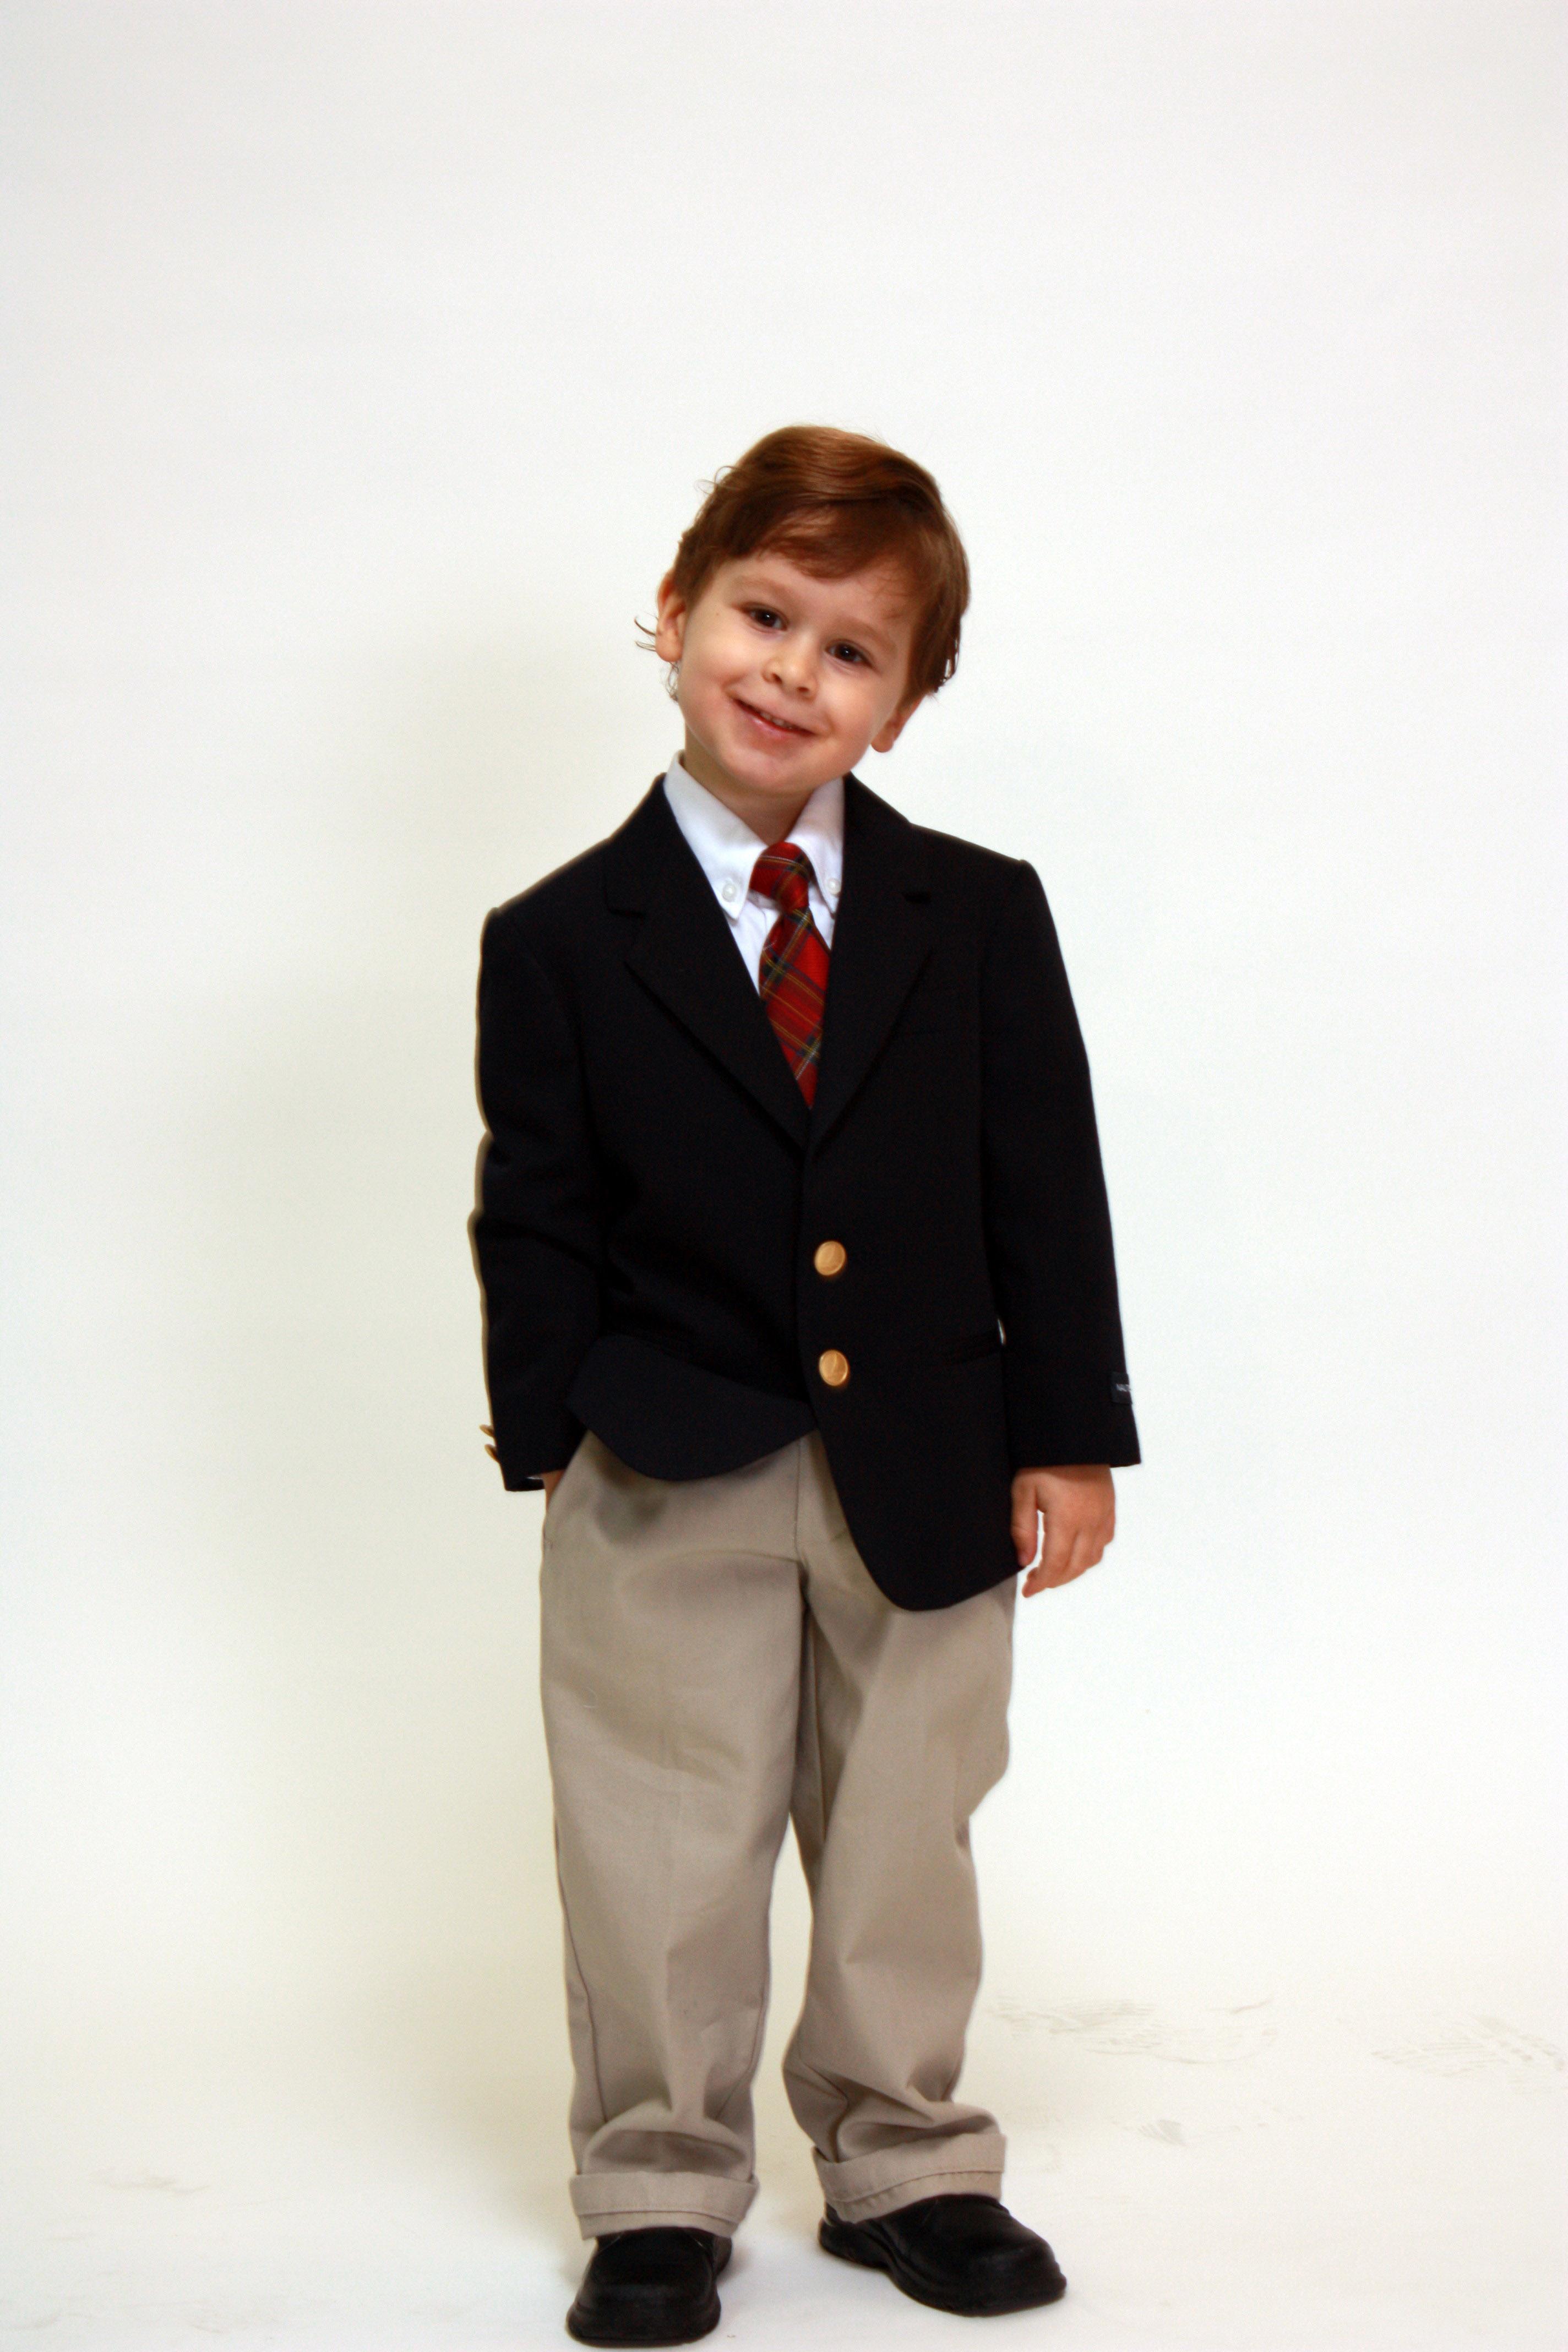 children wearing school uniform